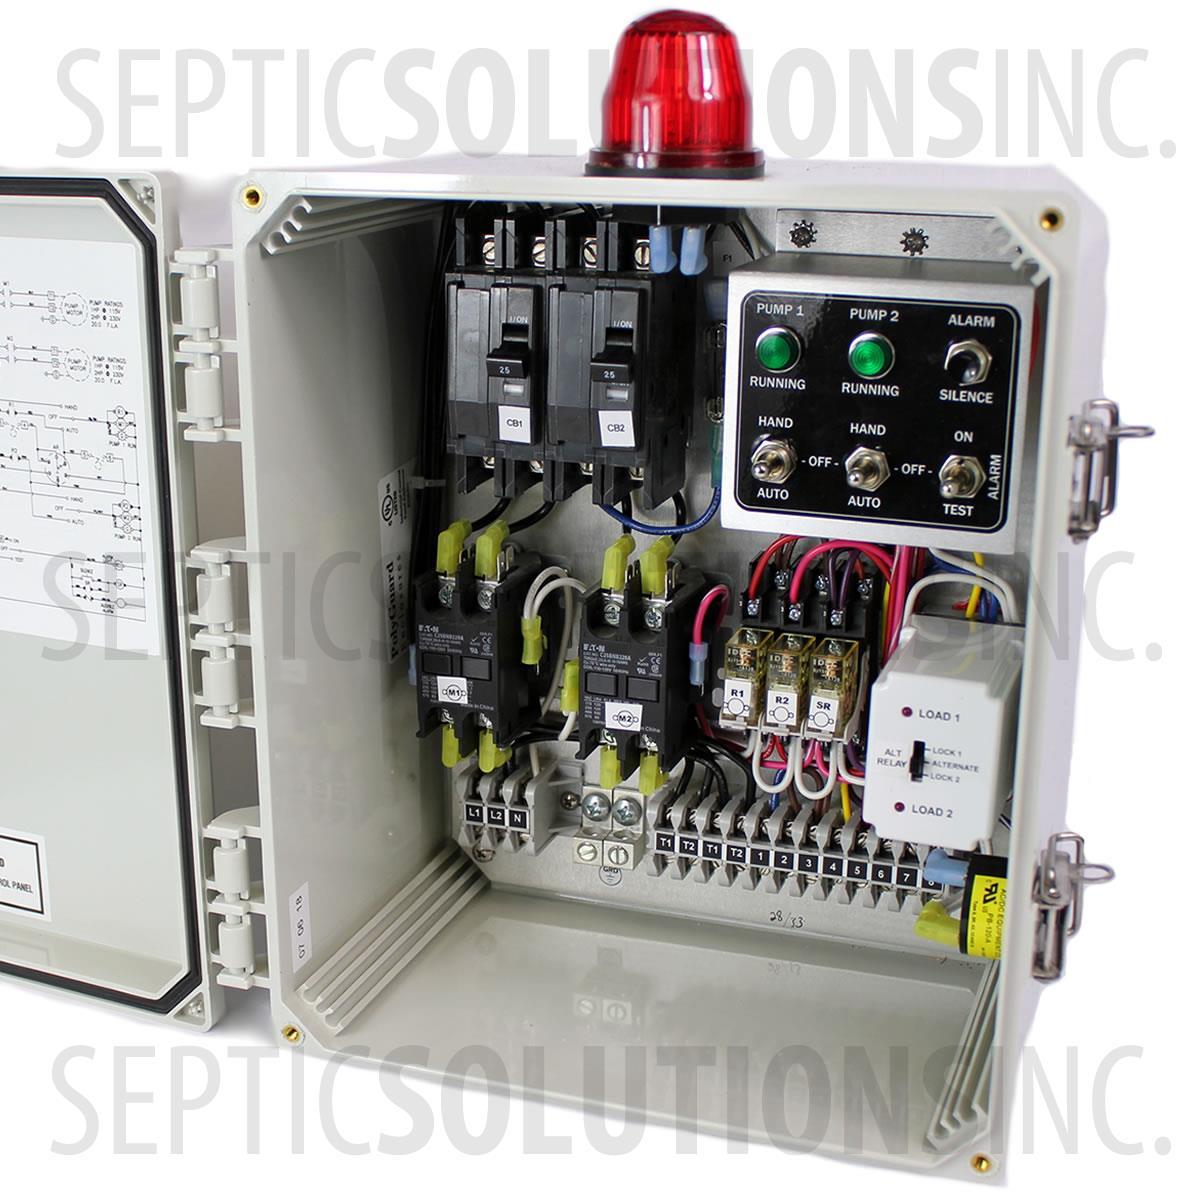 duplex pump control panel schematic low level switch motor sje rhombus wiring diagram panels sje control rhombus 1121w120h16b17c [ 1200 x 1200 Pixel ]